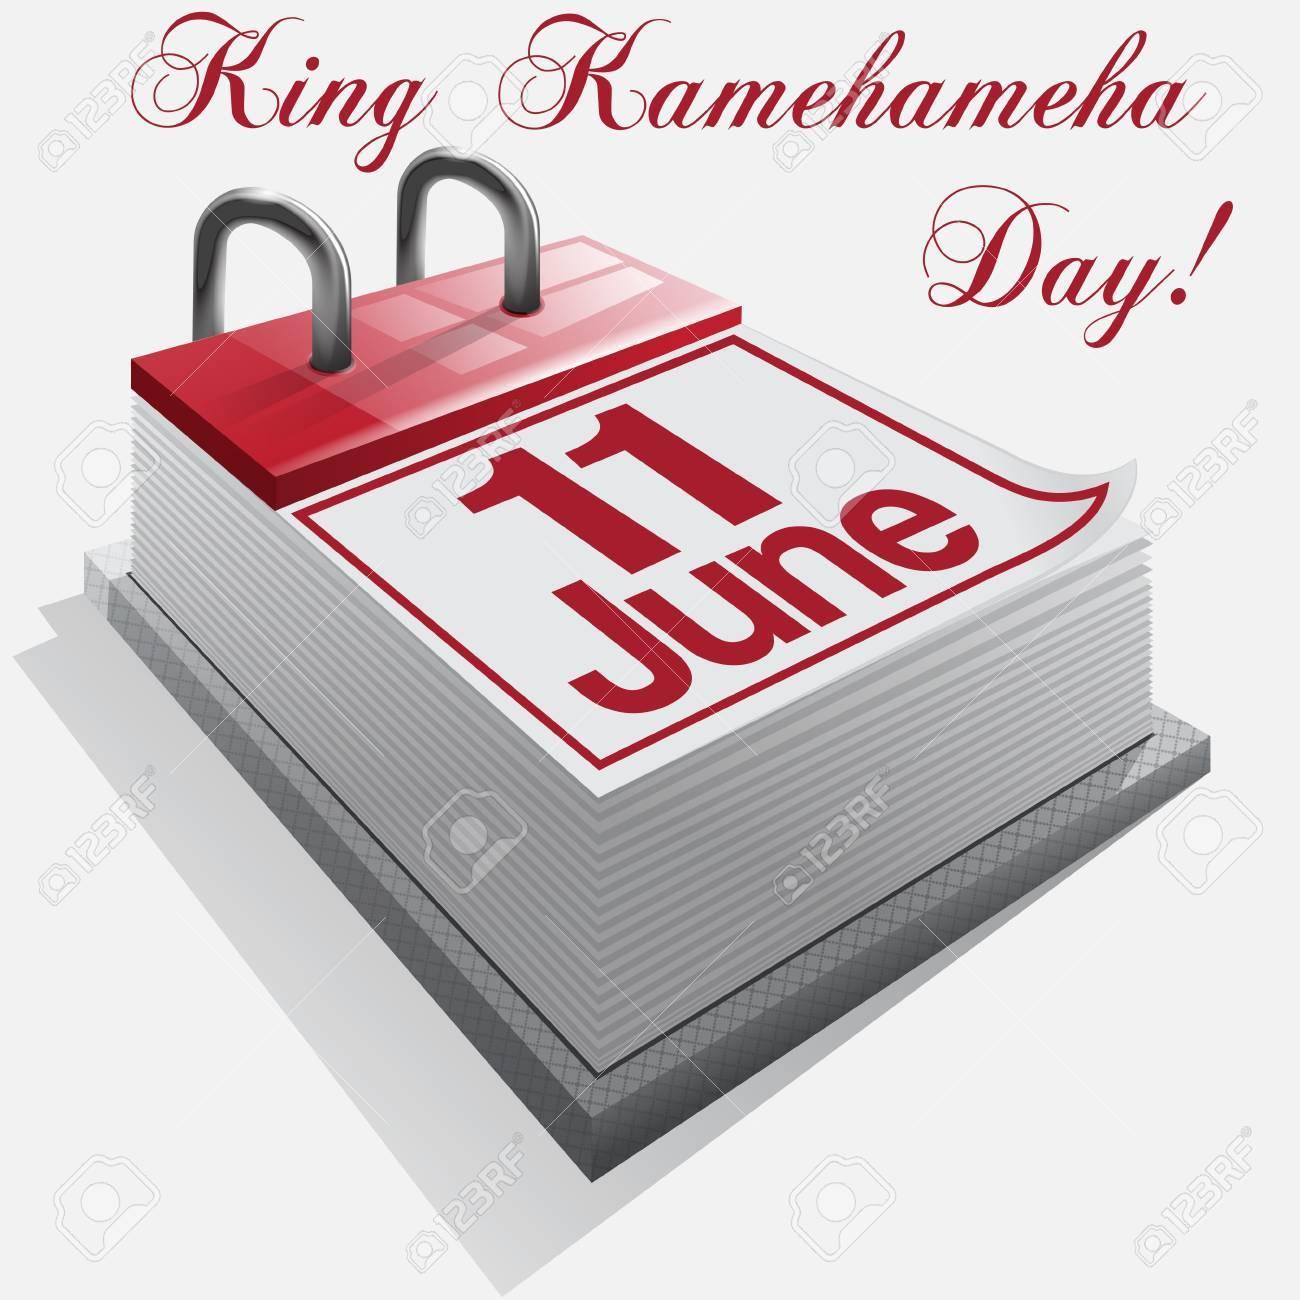 calendar 11 June, King Kamehameha Day Stock Vector - 19006887